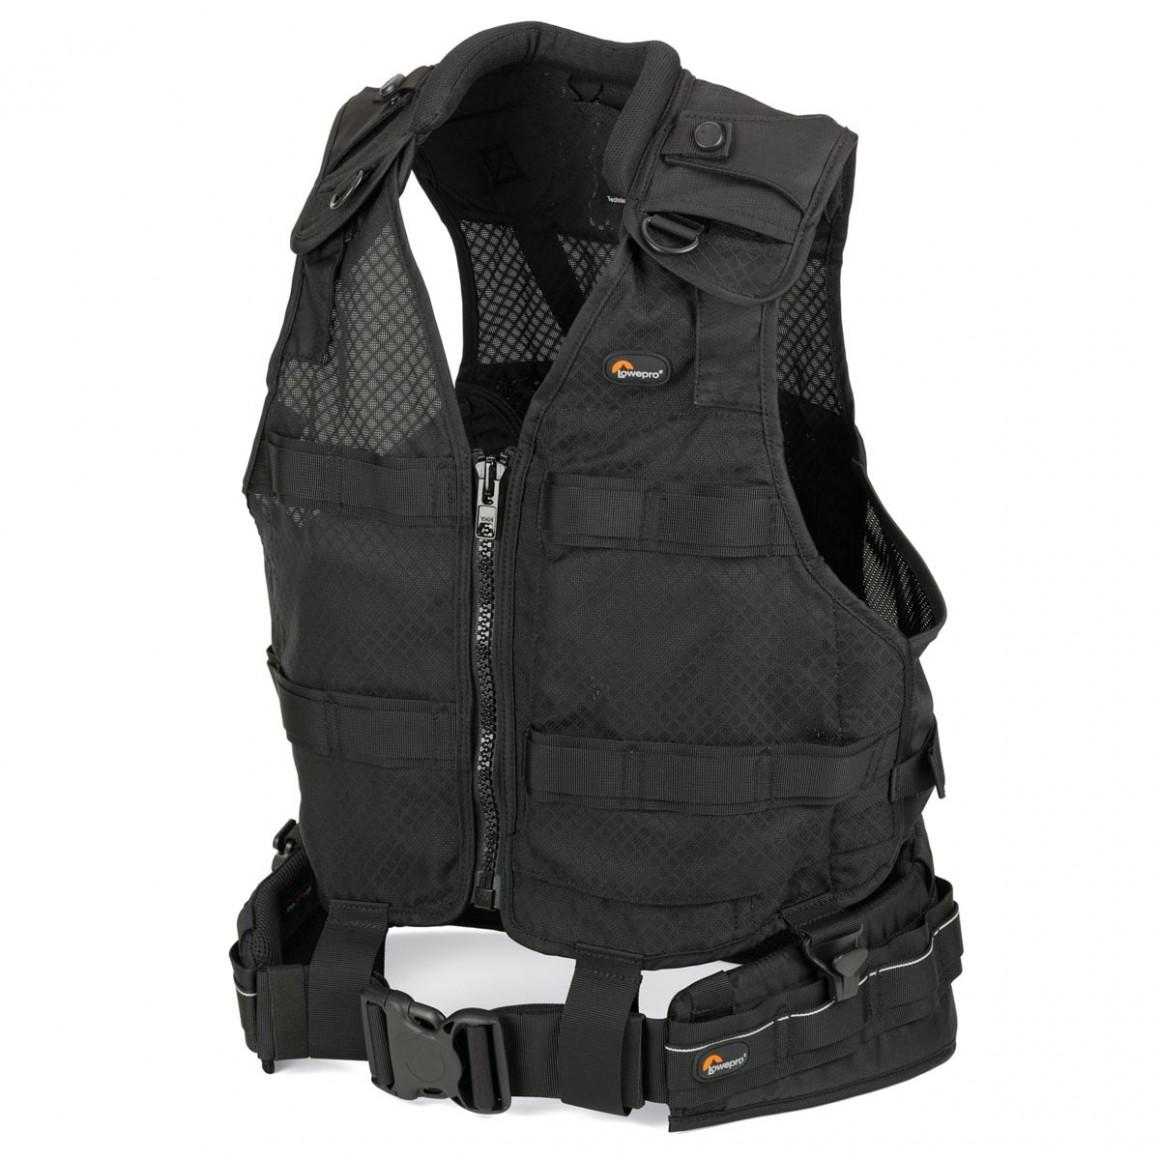 SF_DLXBelt_TechVest_Left_1 lowepro s&f deluxe belt & vest kit (s m l xl)  at nearapp.co